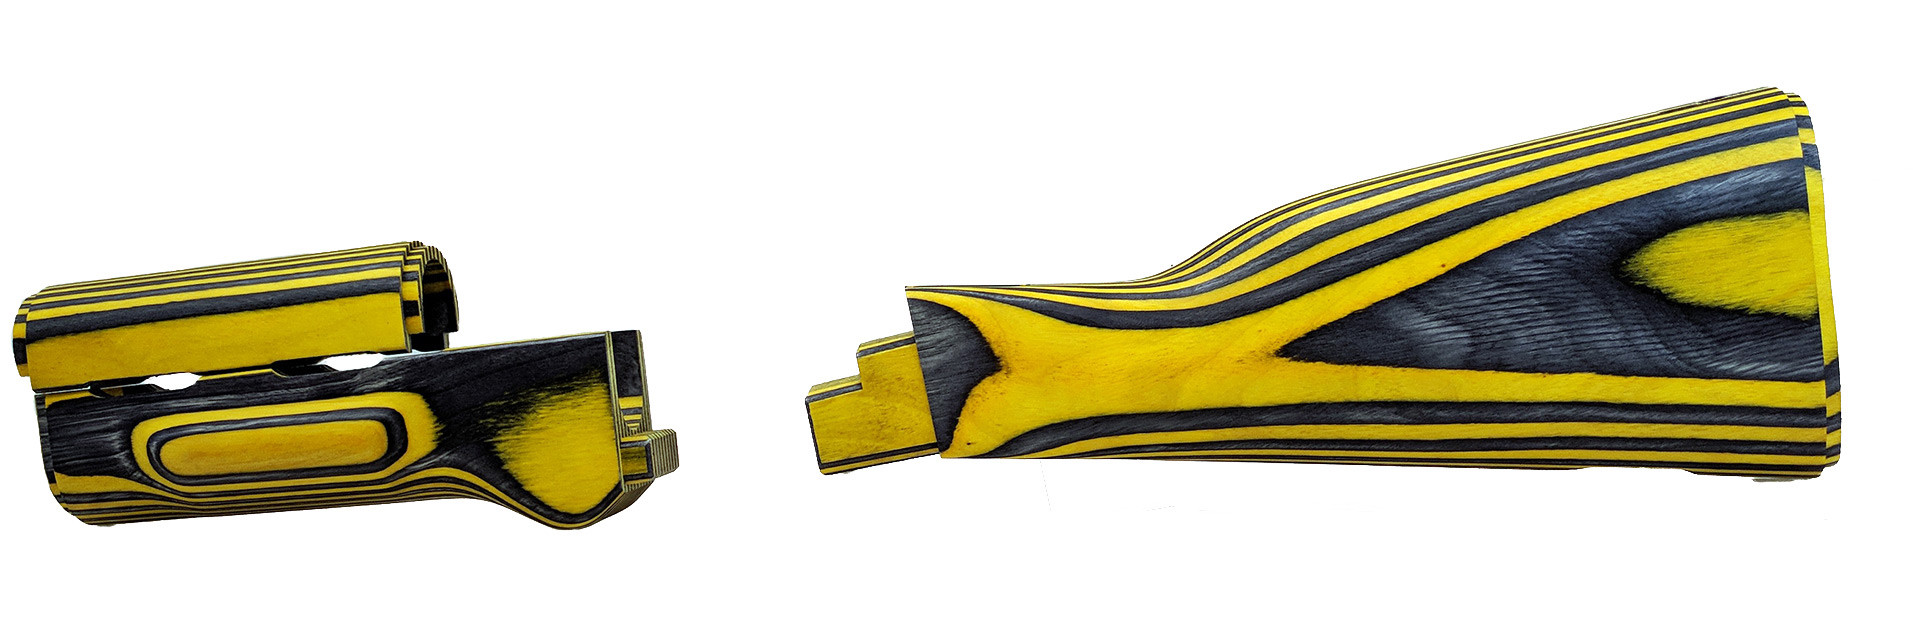 AK Laminated Furniture Set, Yellow, w/o Grip, *NEW*